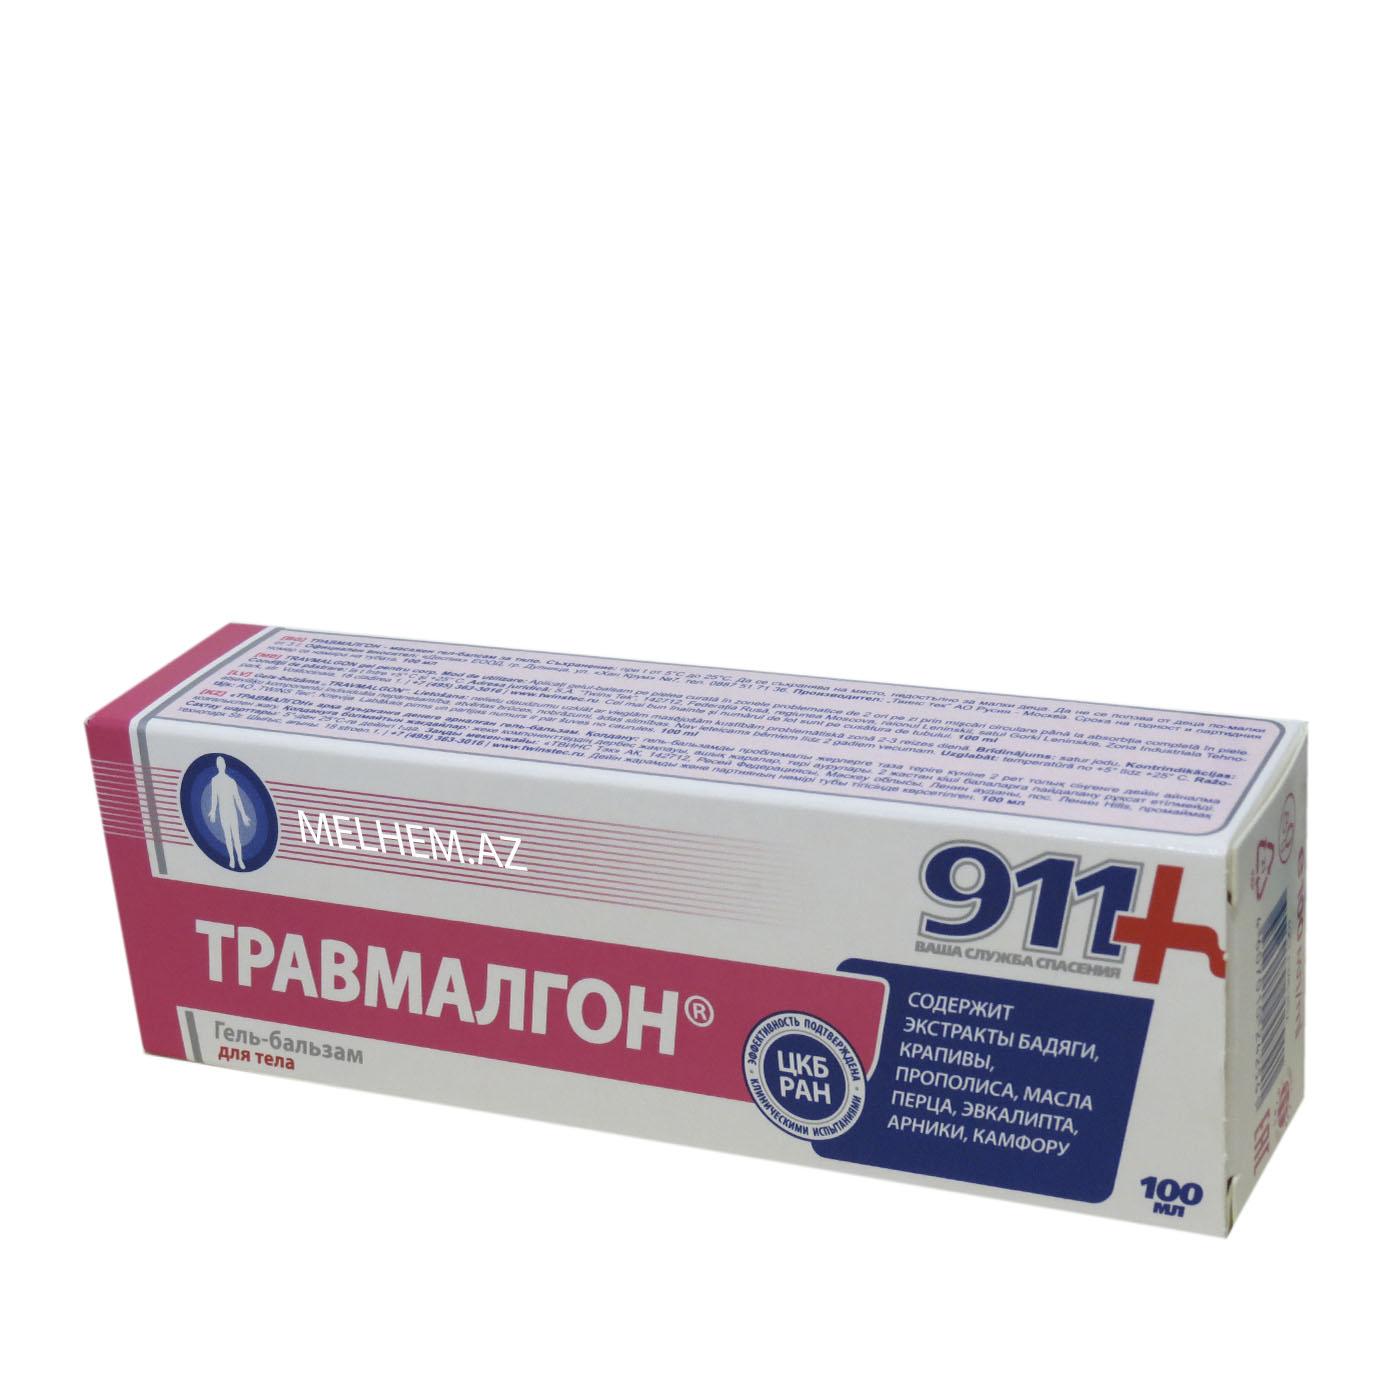 TRAVMALQON 100ML (KREM)